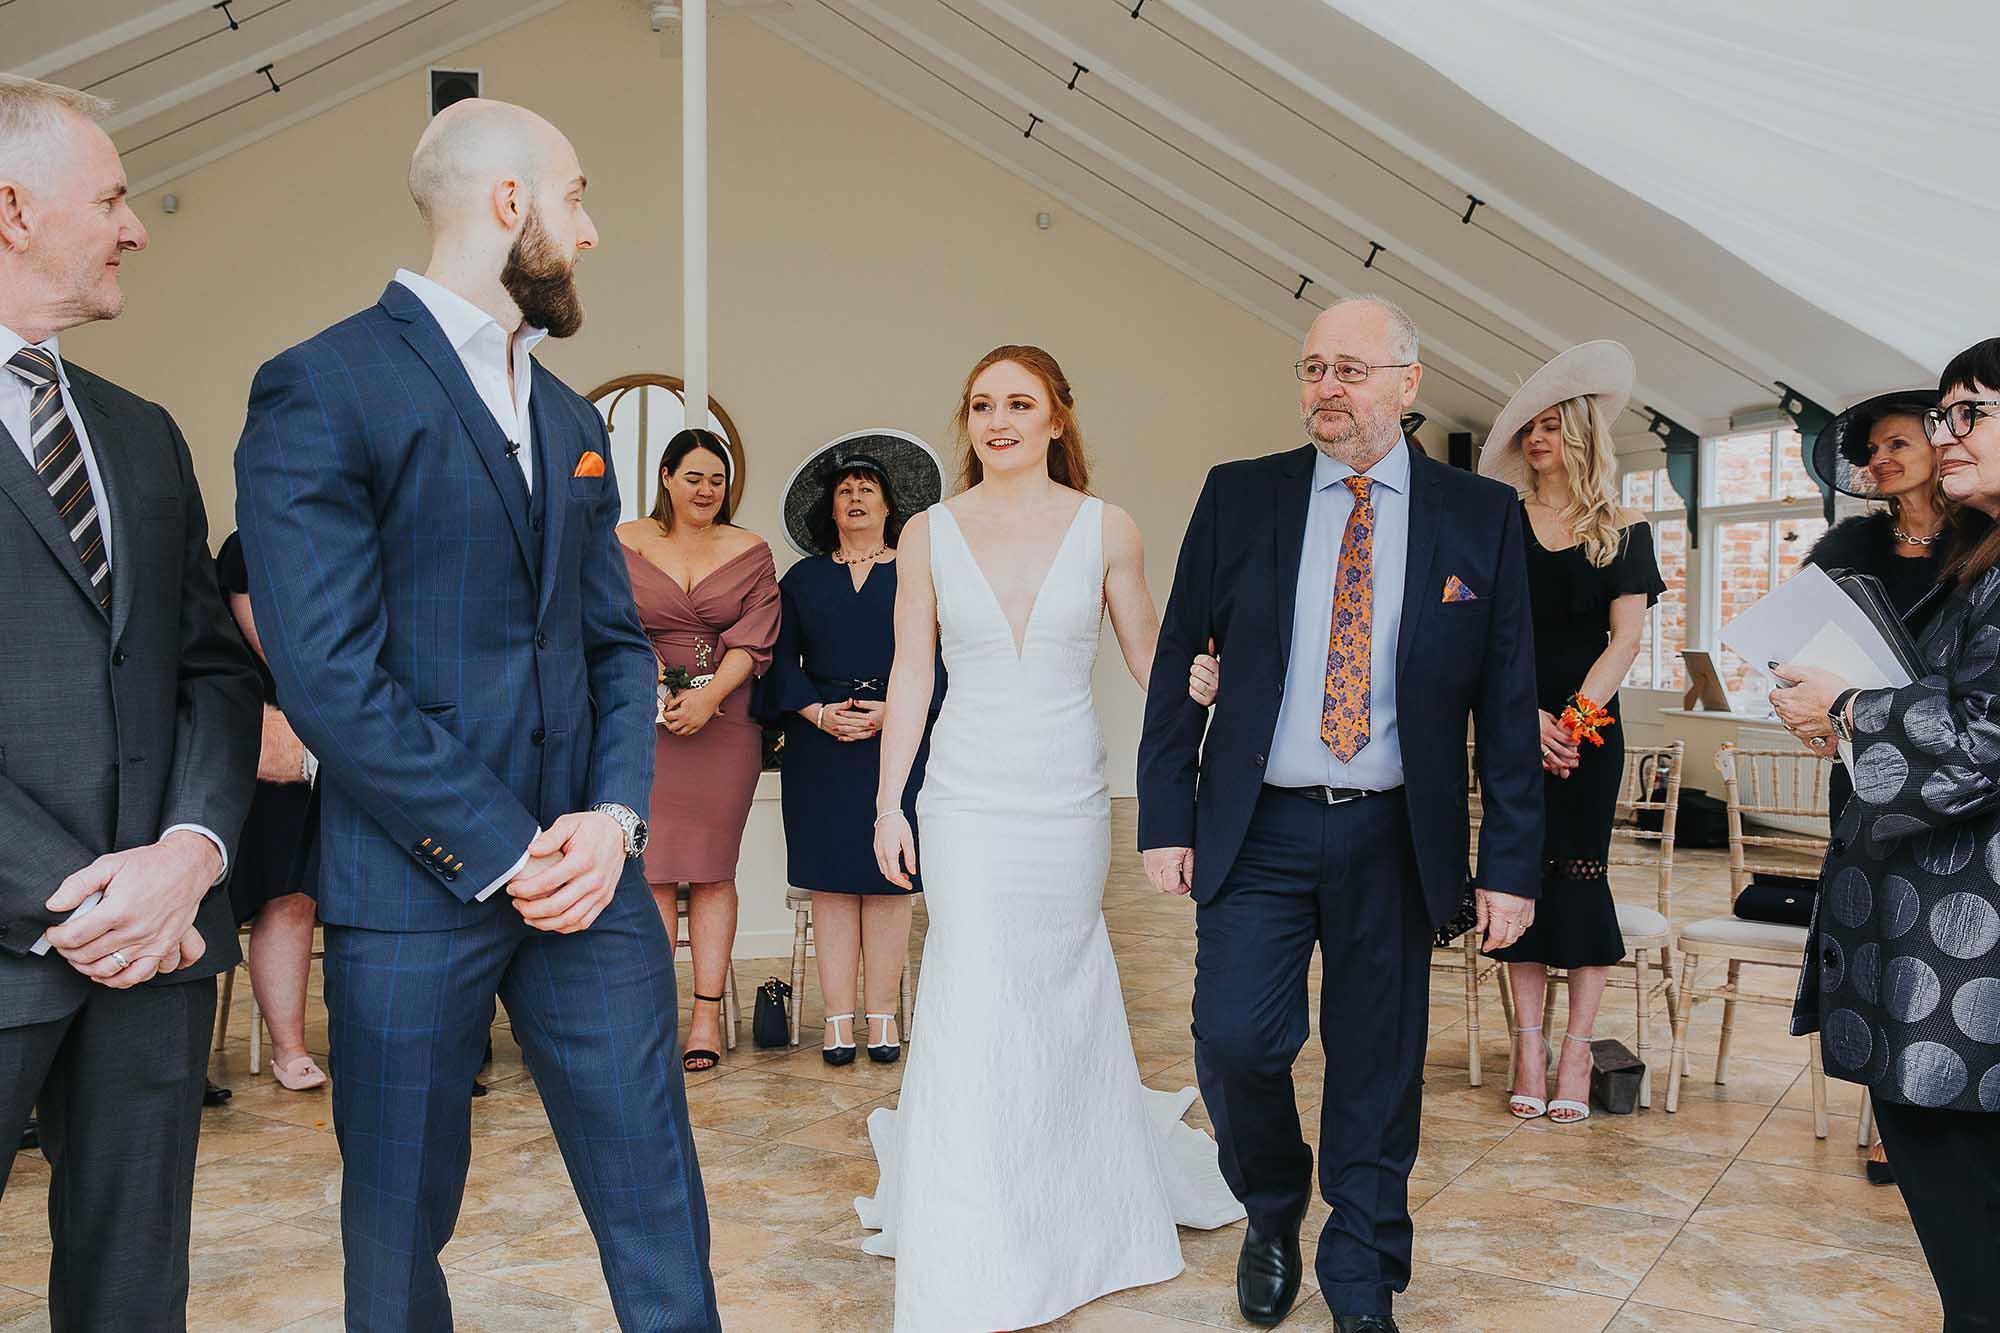 Combermere Abbey wedding Glasshouse ceremony